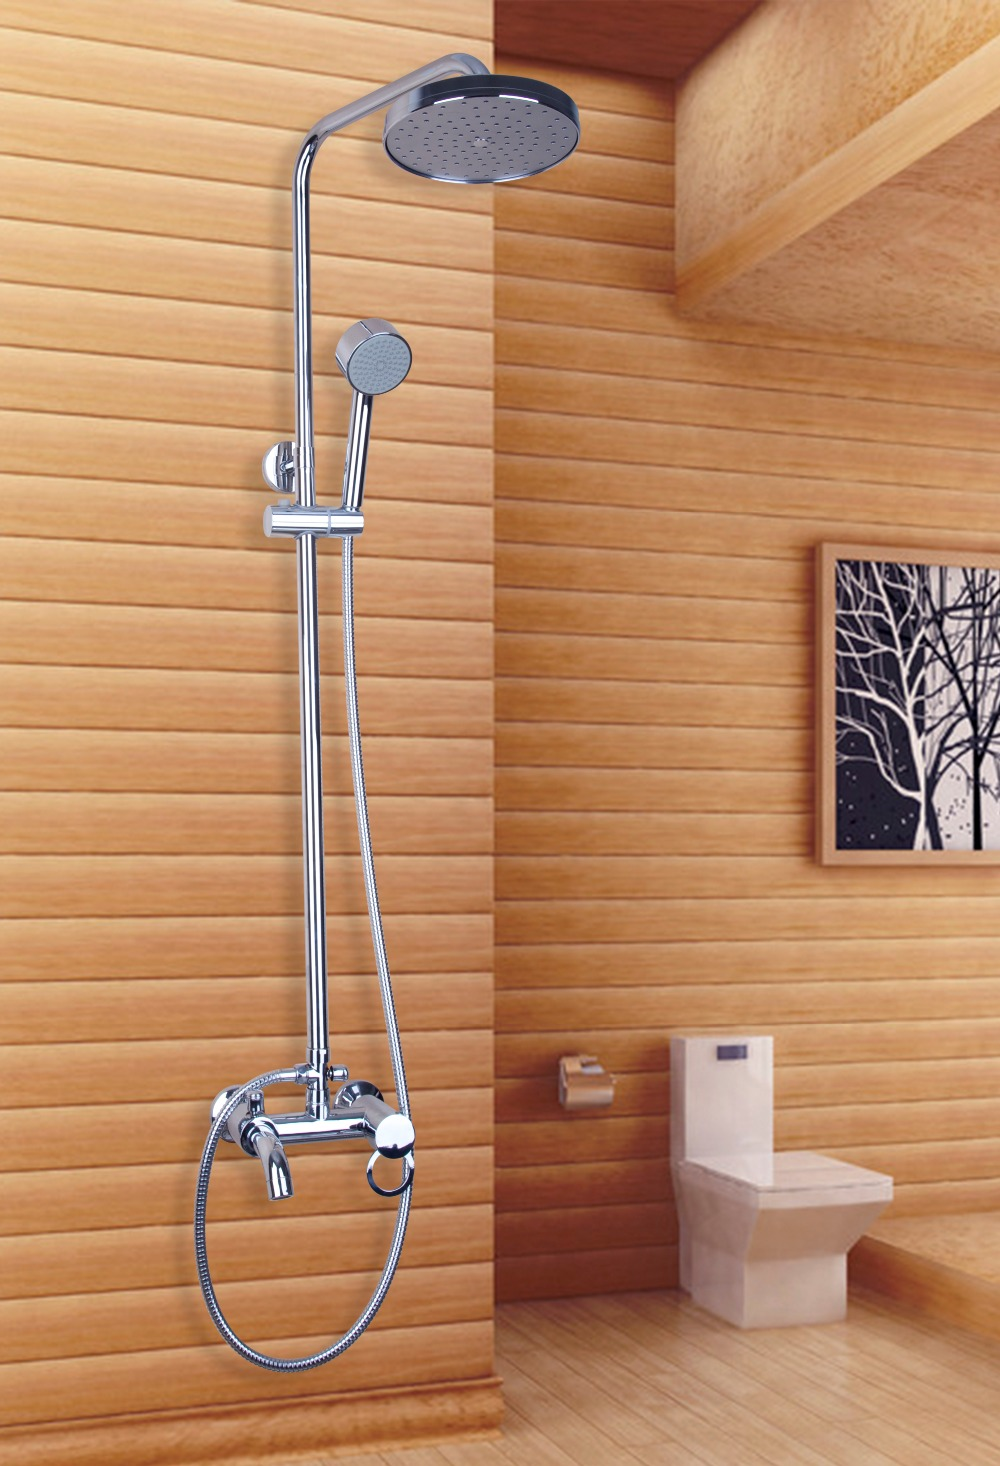 Bathroom showers head - Adjustable Height 8 Shower Head Bathroom Bath And Shower Mixer Hand Shower Bathroom Shower Set